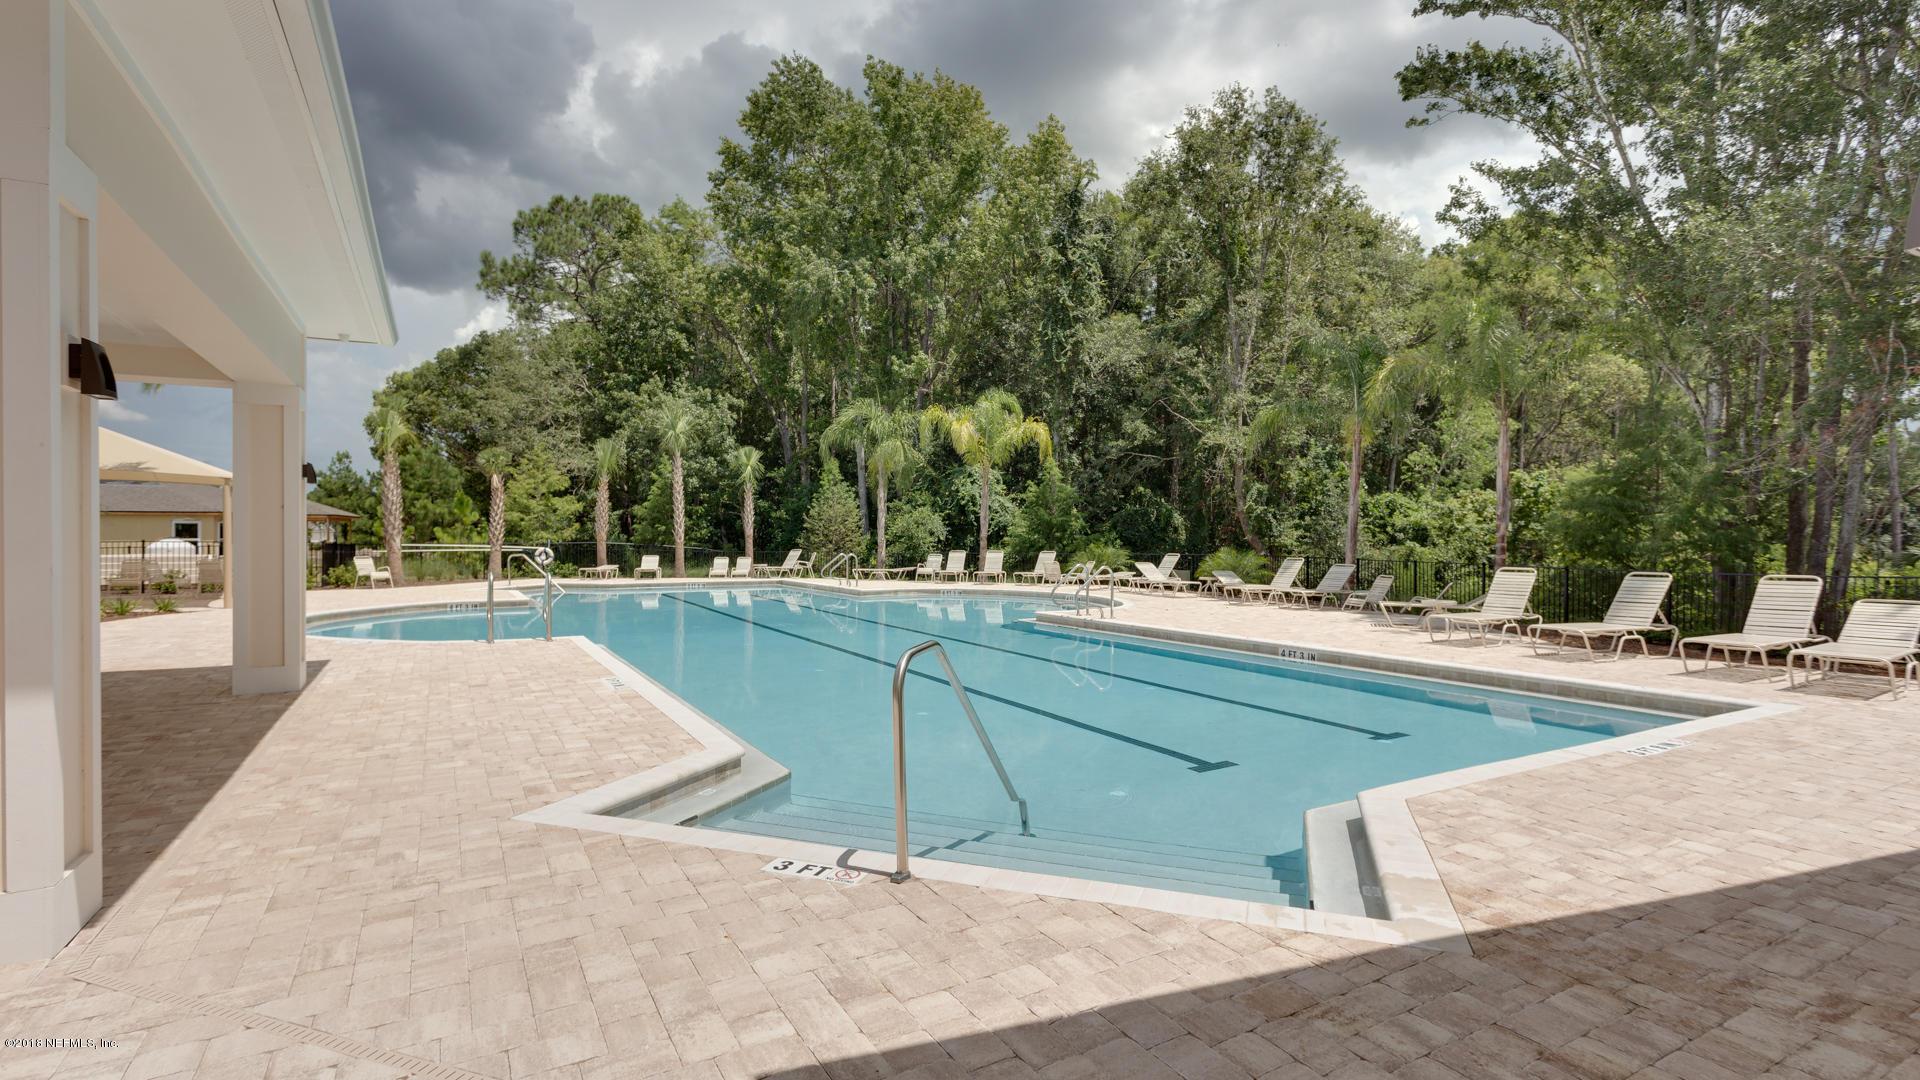 15782 WHITEBARK, JACKSONVILLE, FLORIDA 32218, 4 Bedrooms Bedrooms, ,3 BathroomsBathrooms,Residential,For sale,WHITEBARK,1047841